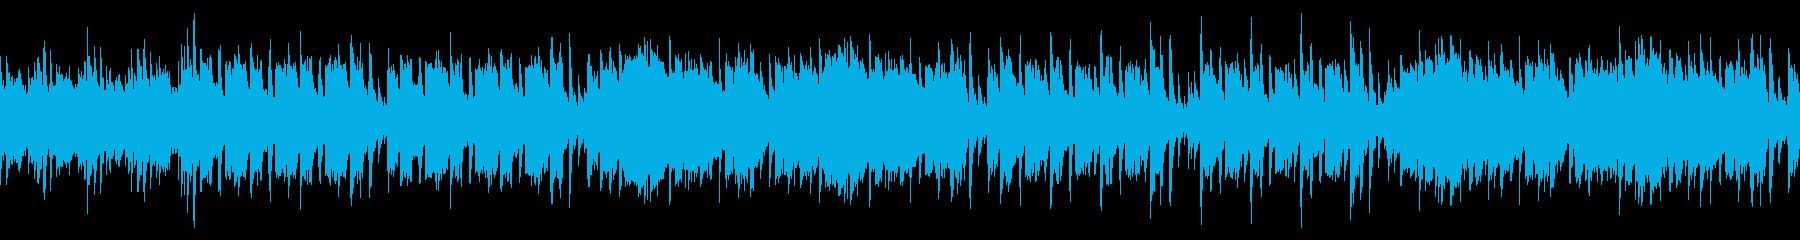 Refreshing violin / quiet karaoke / loop's reproduced waveform